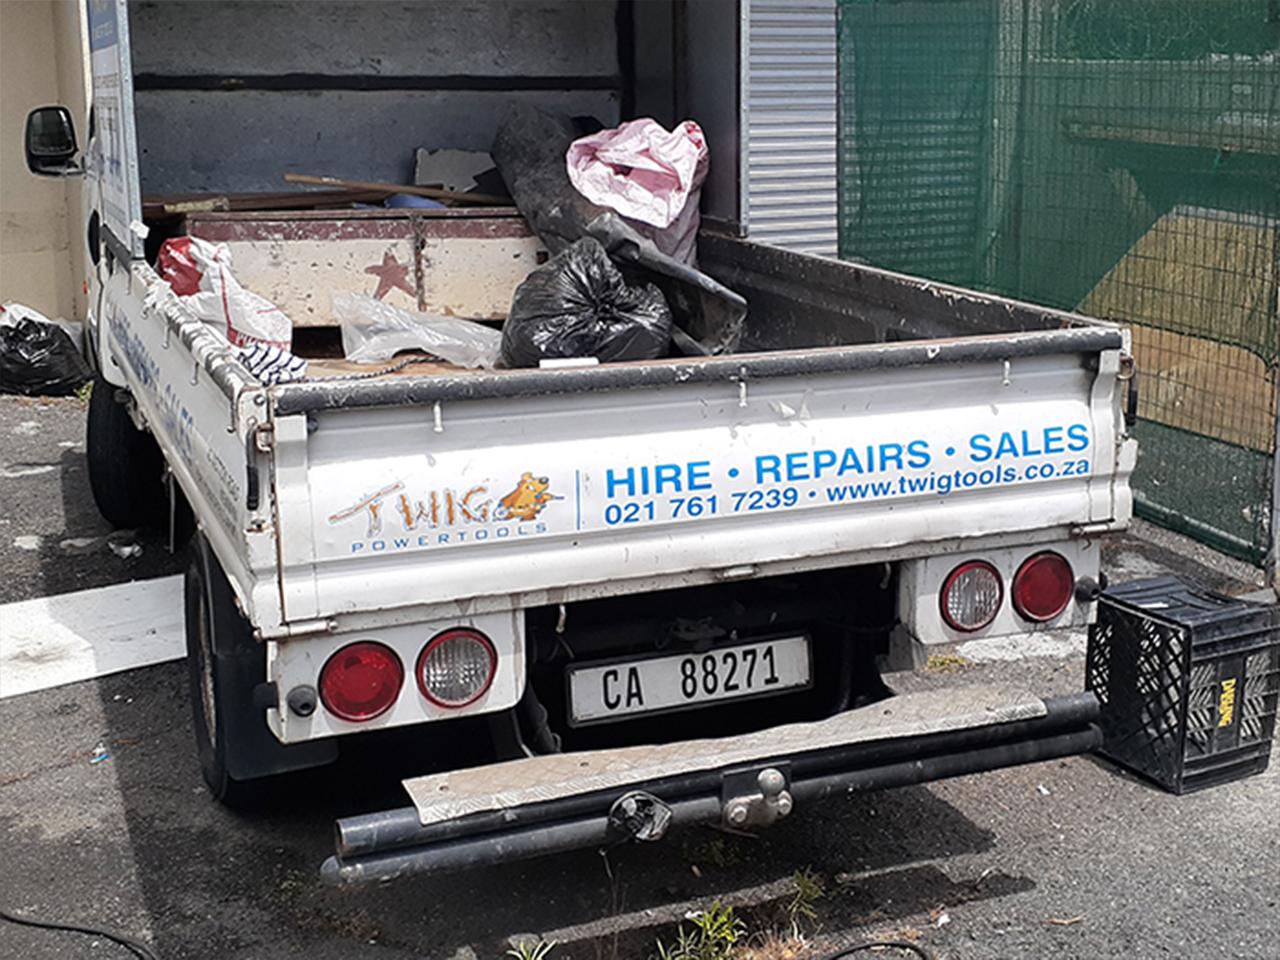 Twig Powertools Vehicle Branding